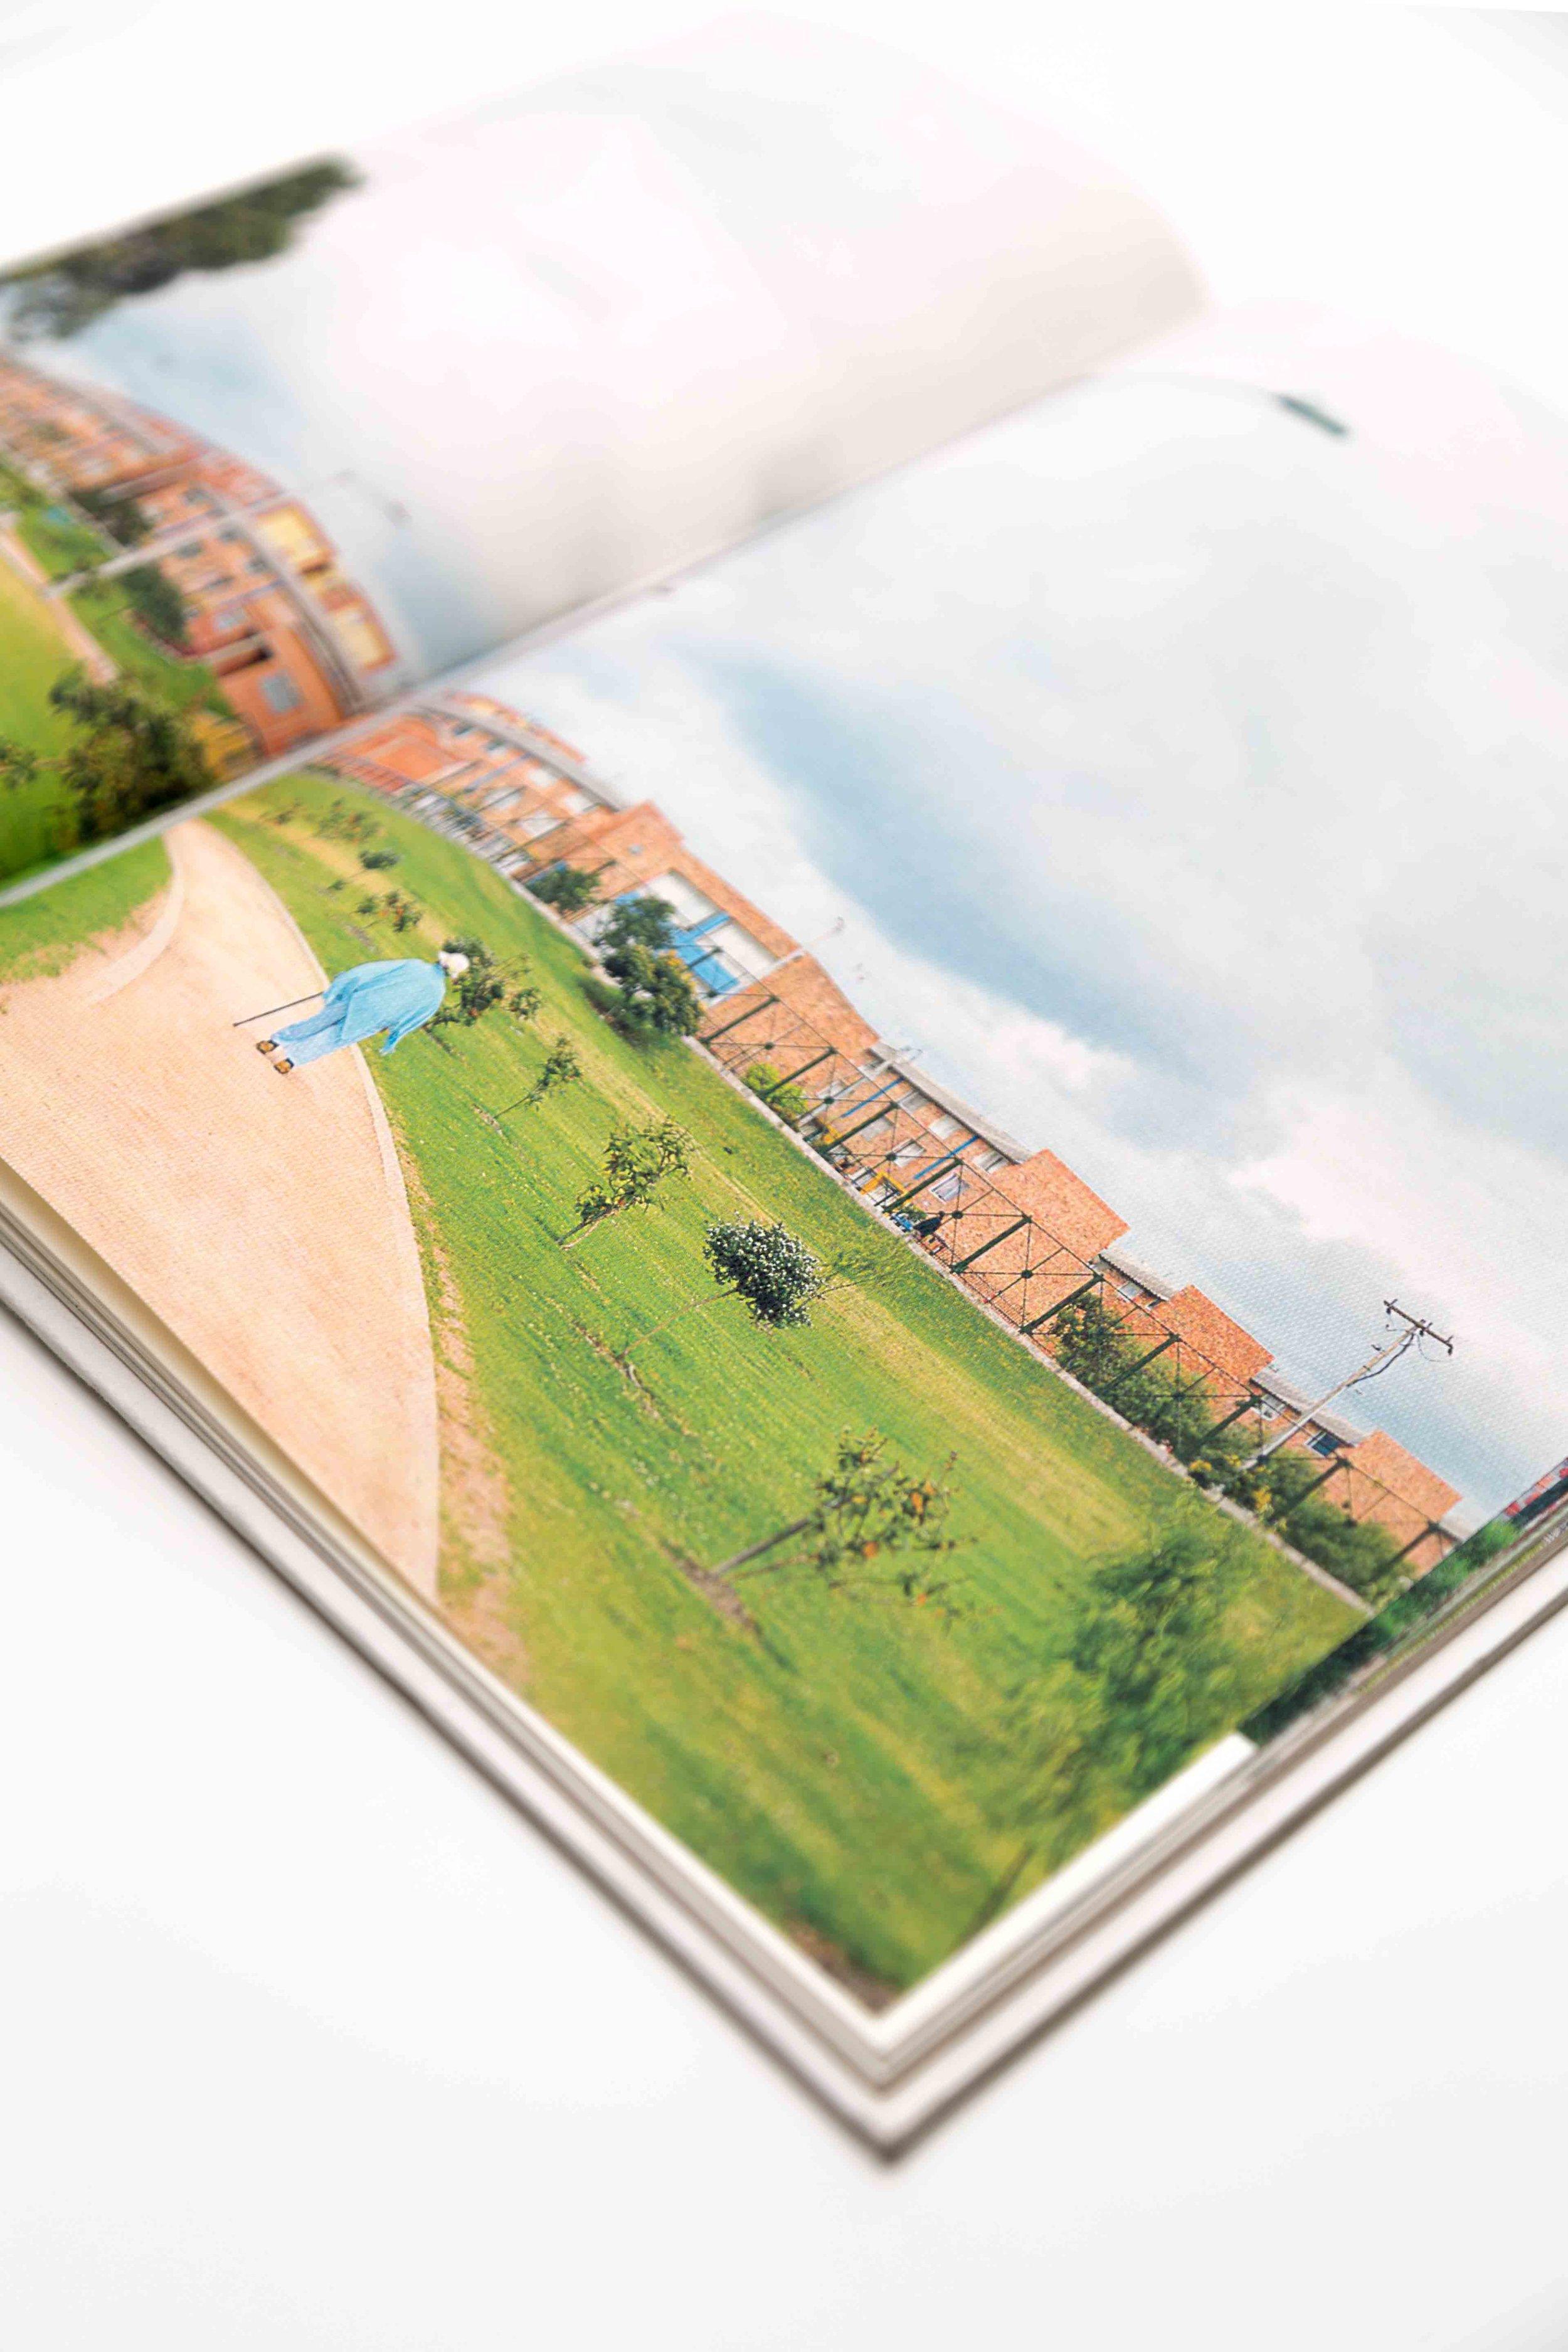 Fotolibro Colombiano - a place to live - Mateo Gomez García-10.jpg